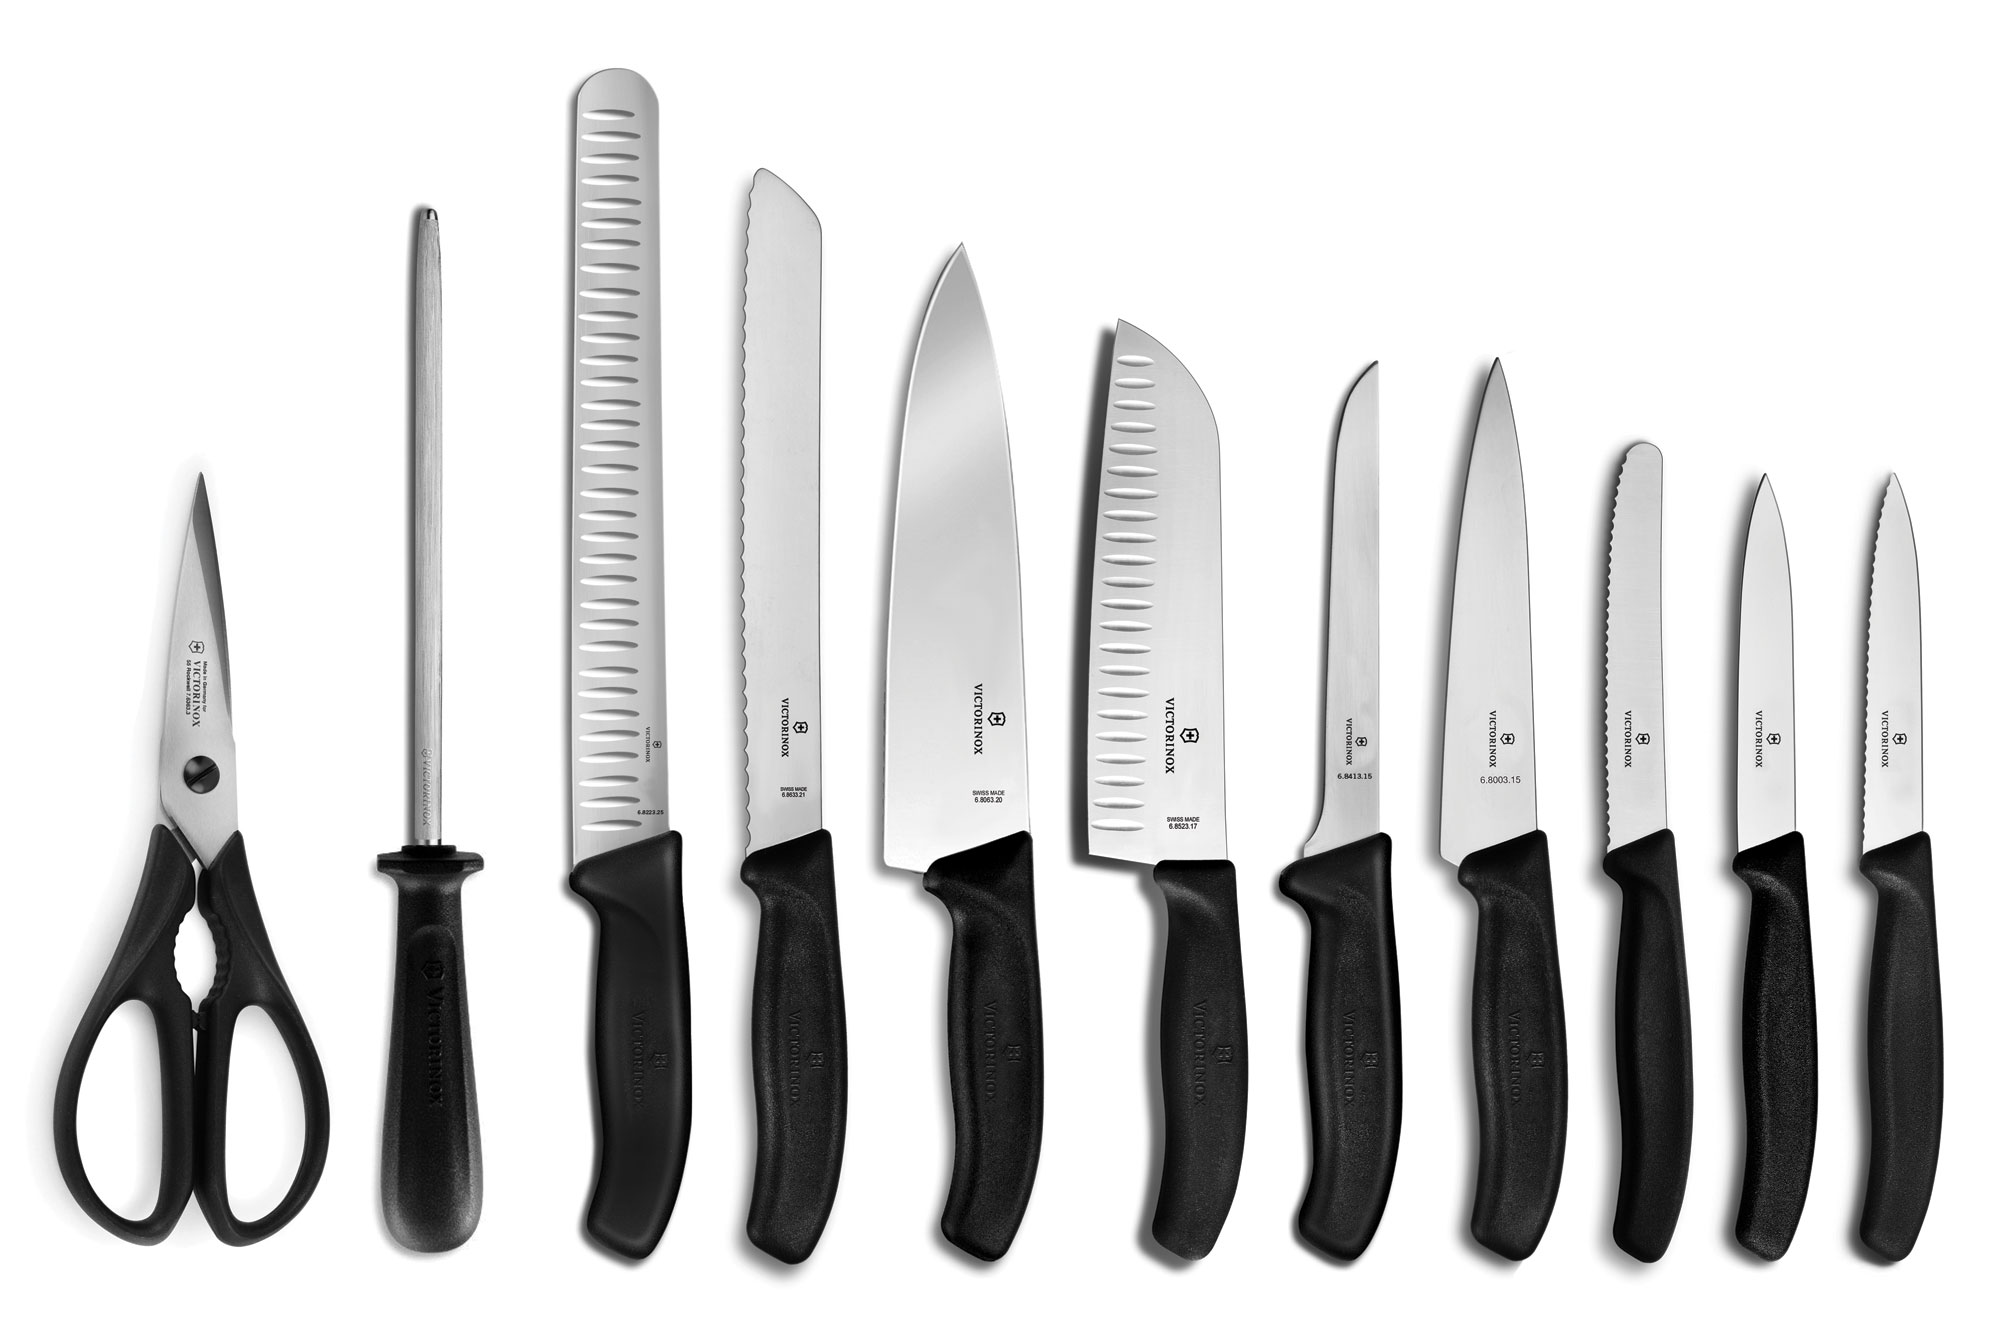 Victorinox Swiss Classic Knife Set 18 Piece Kitchen